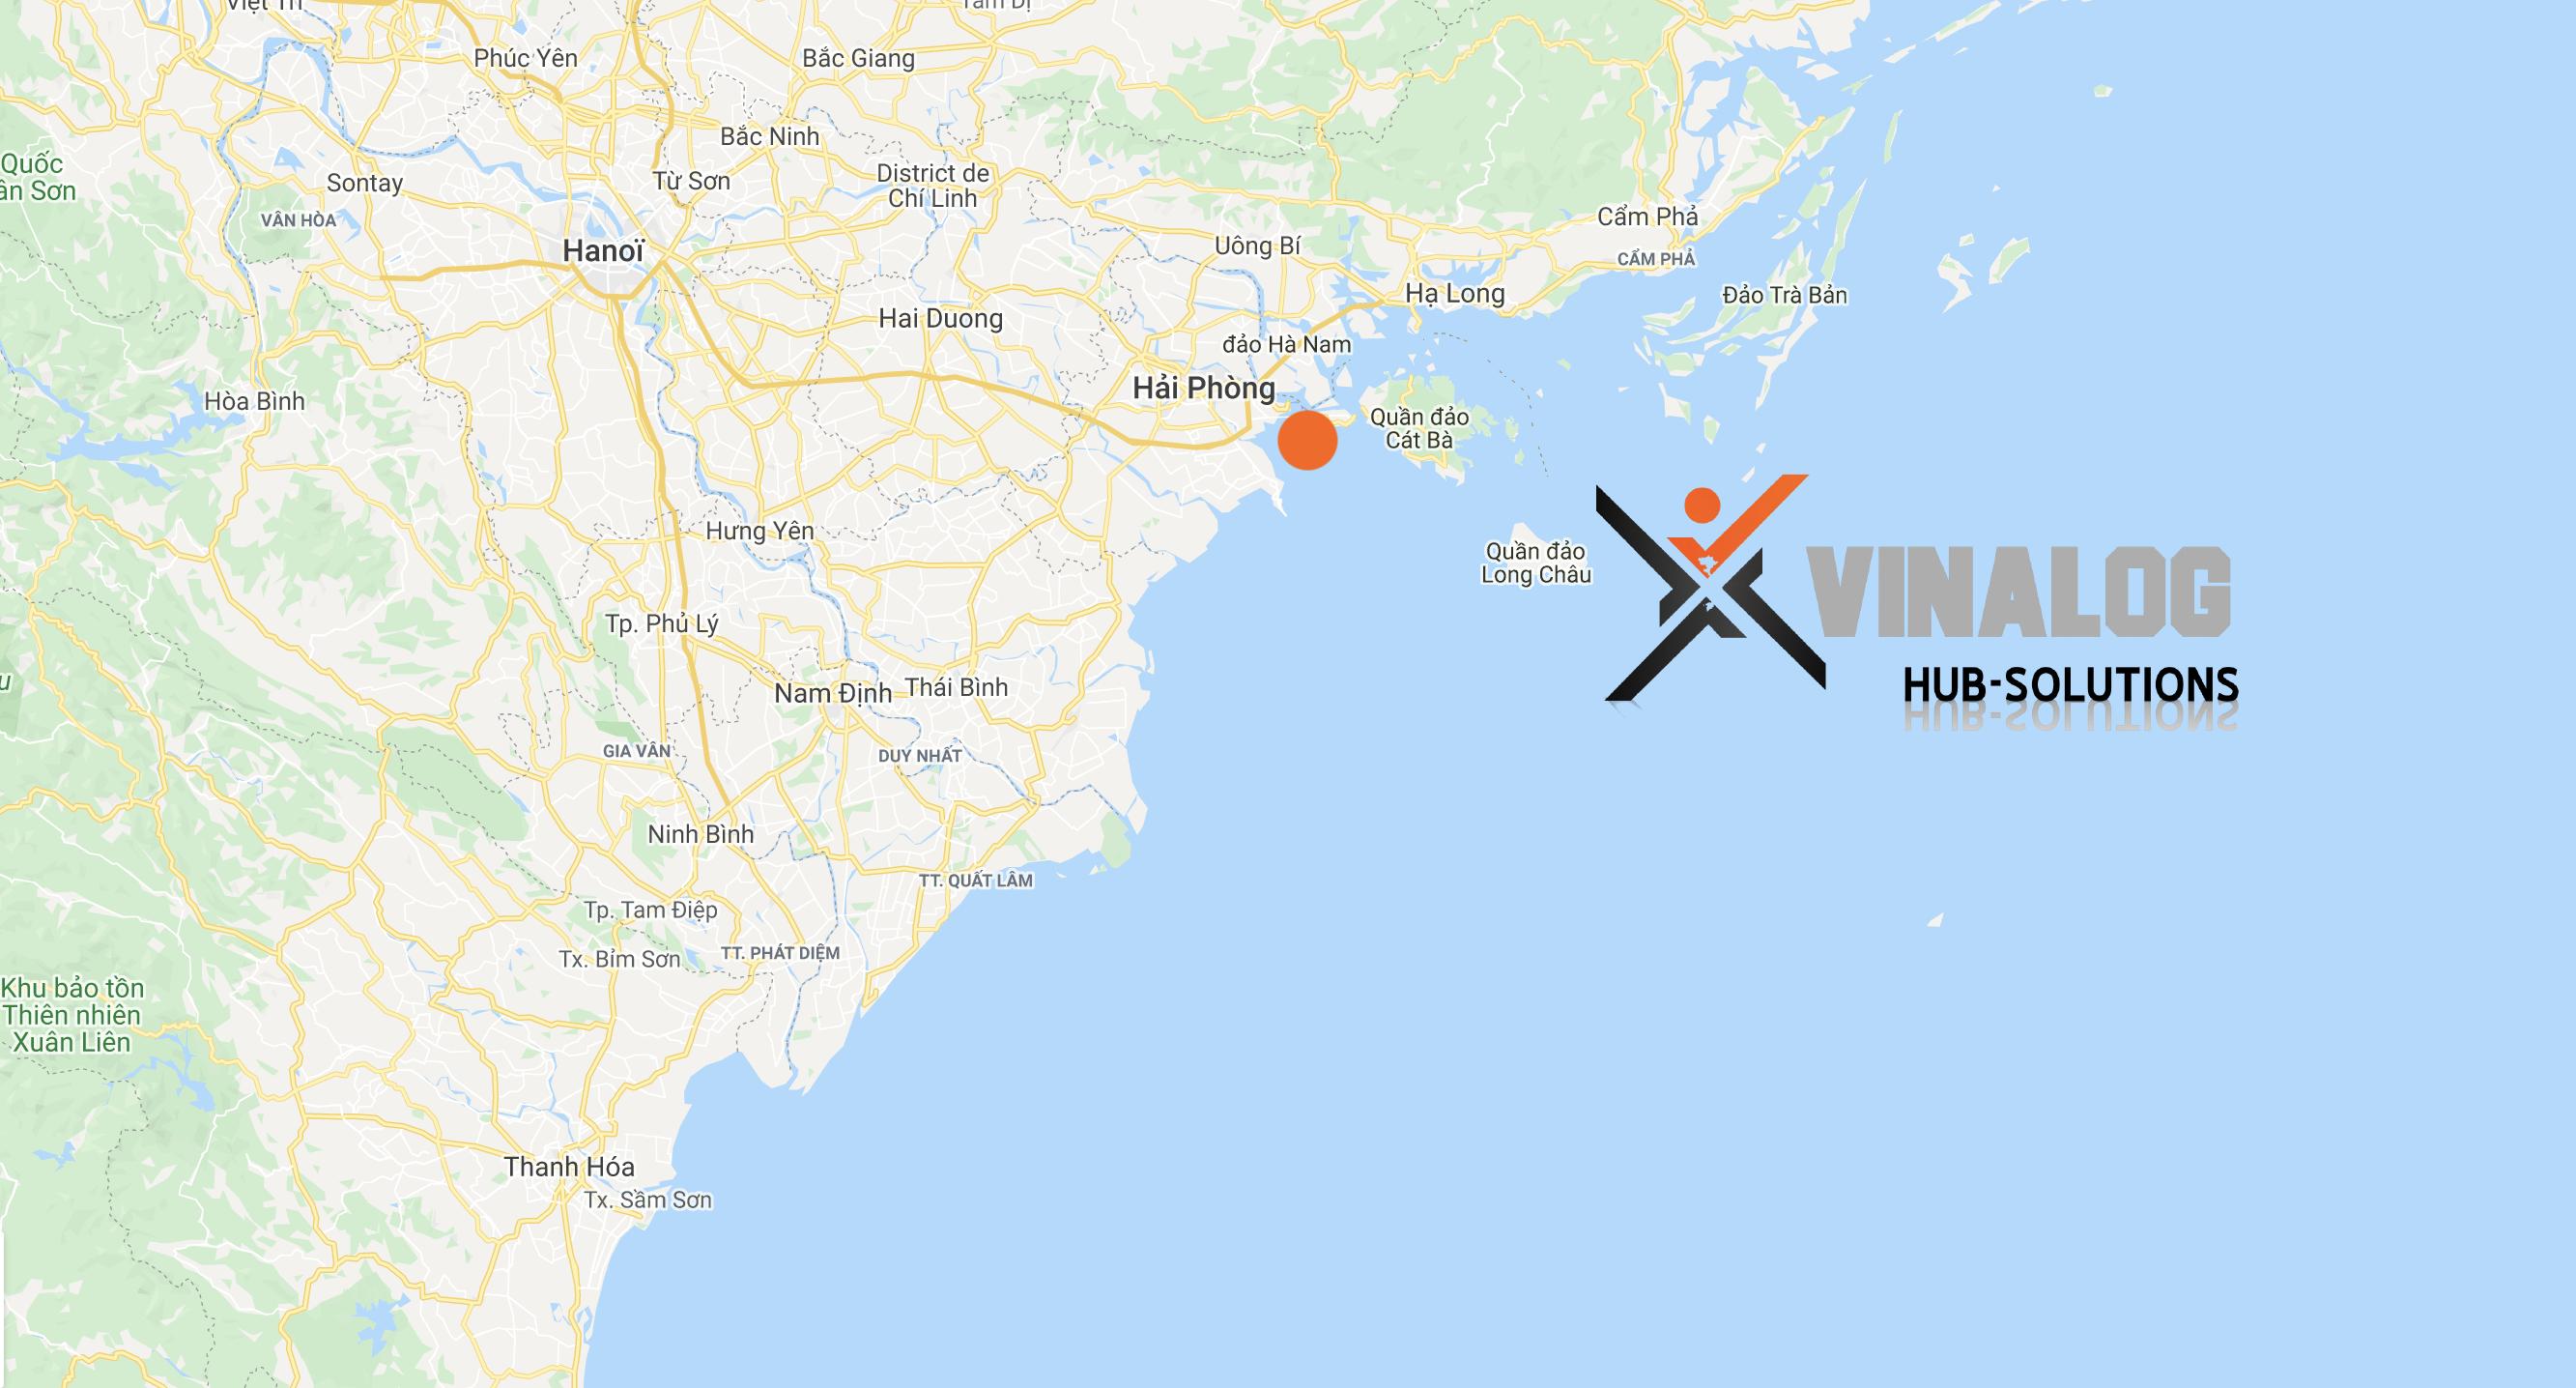 VINALOG - HS Deep Sea HAI PHONG